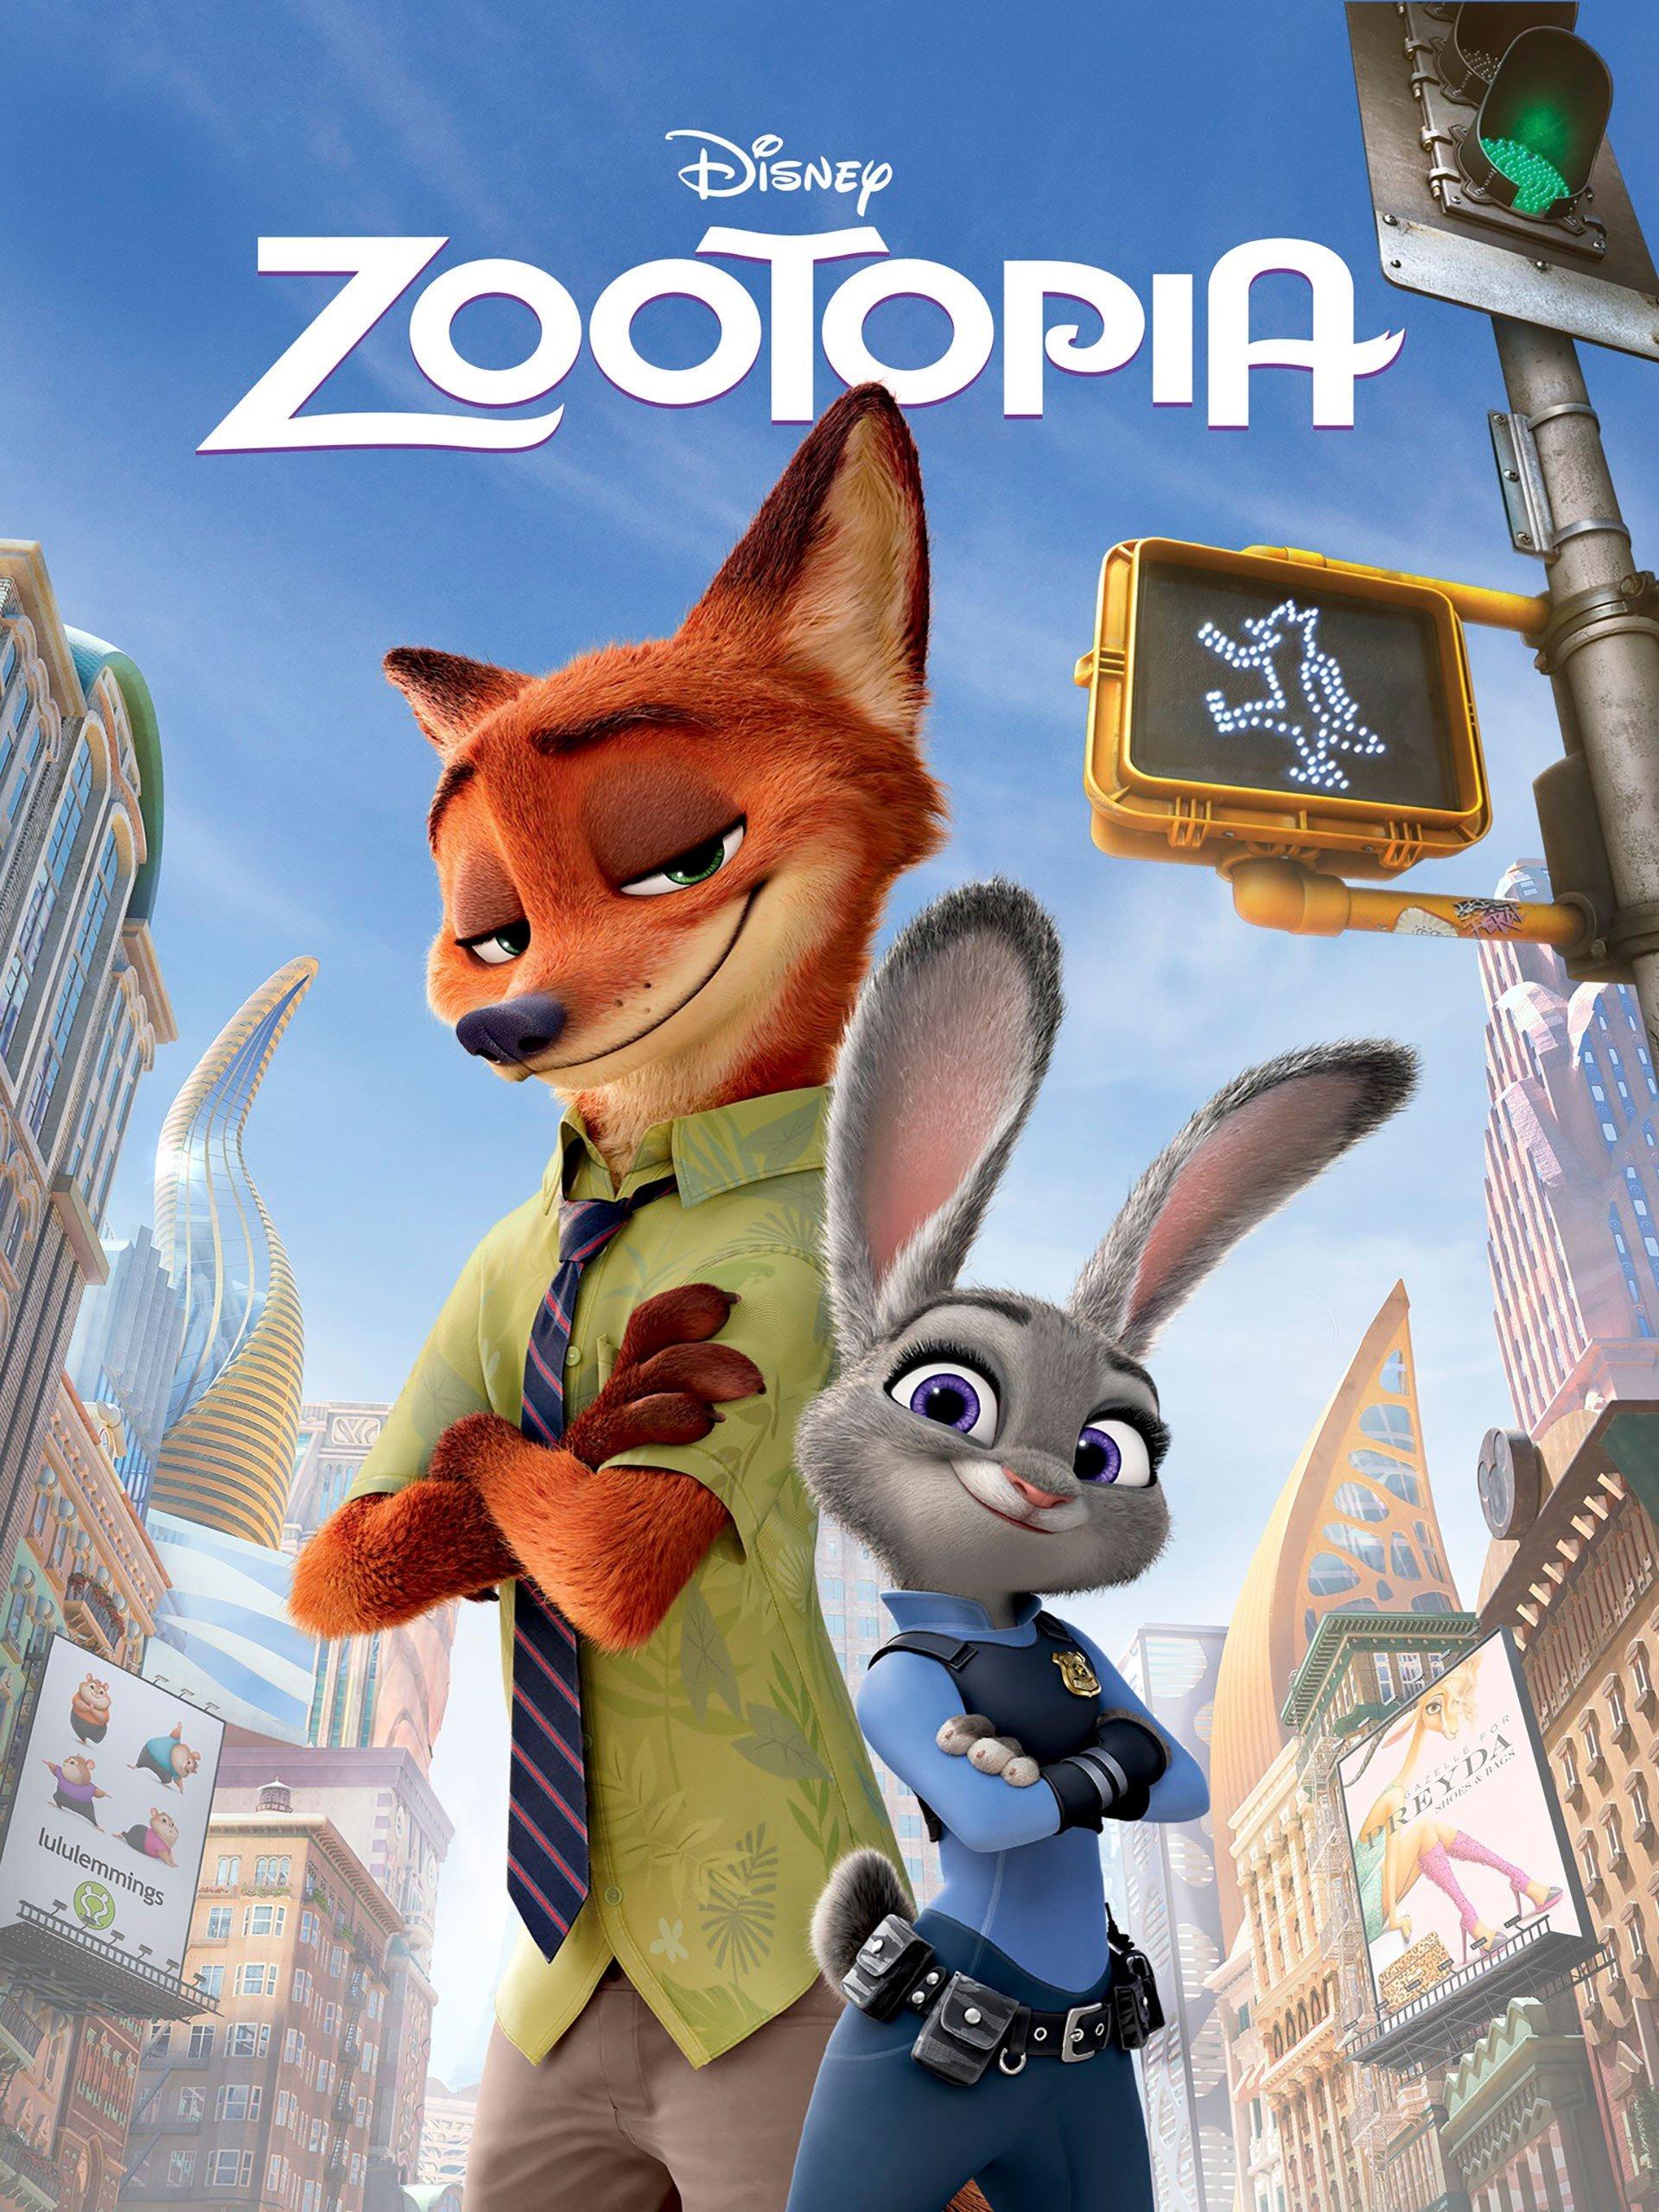 zootopia full movie free stream